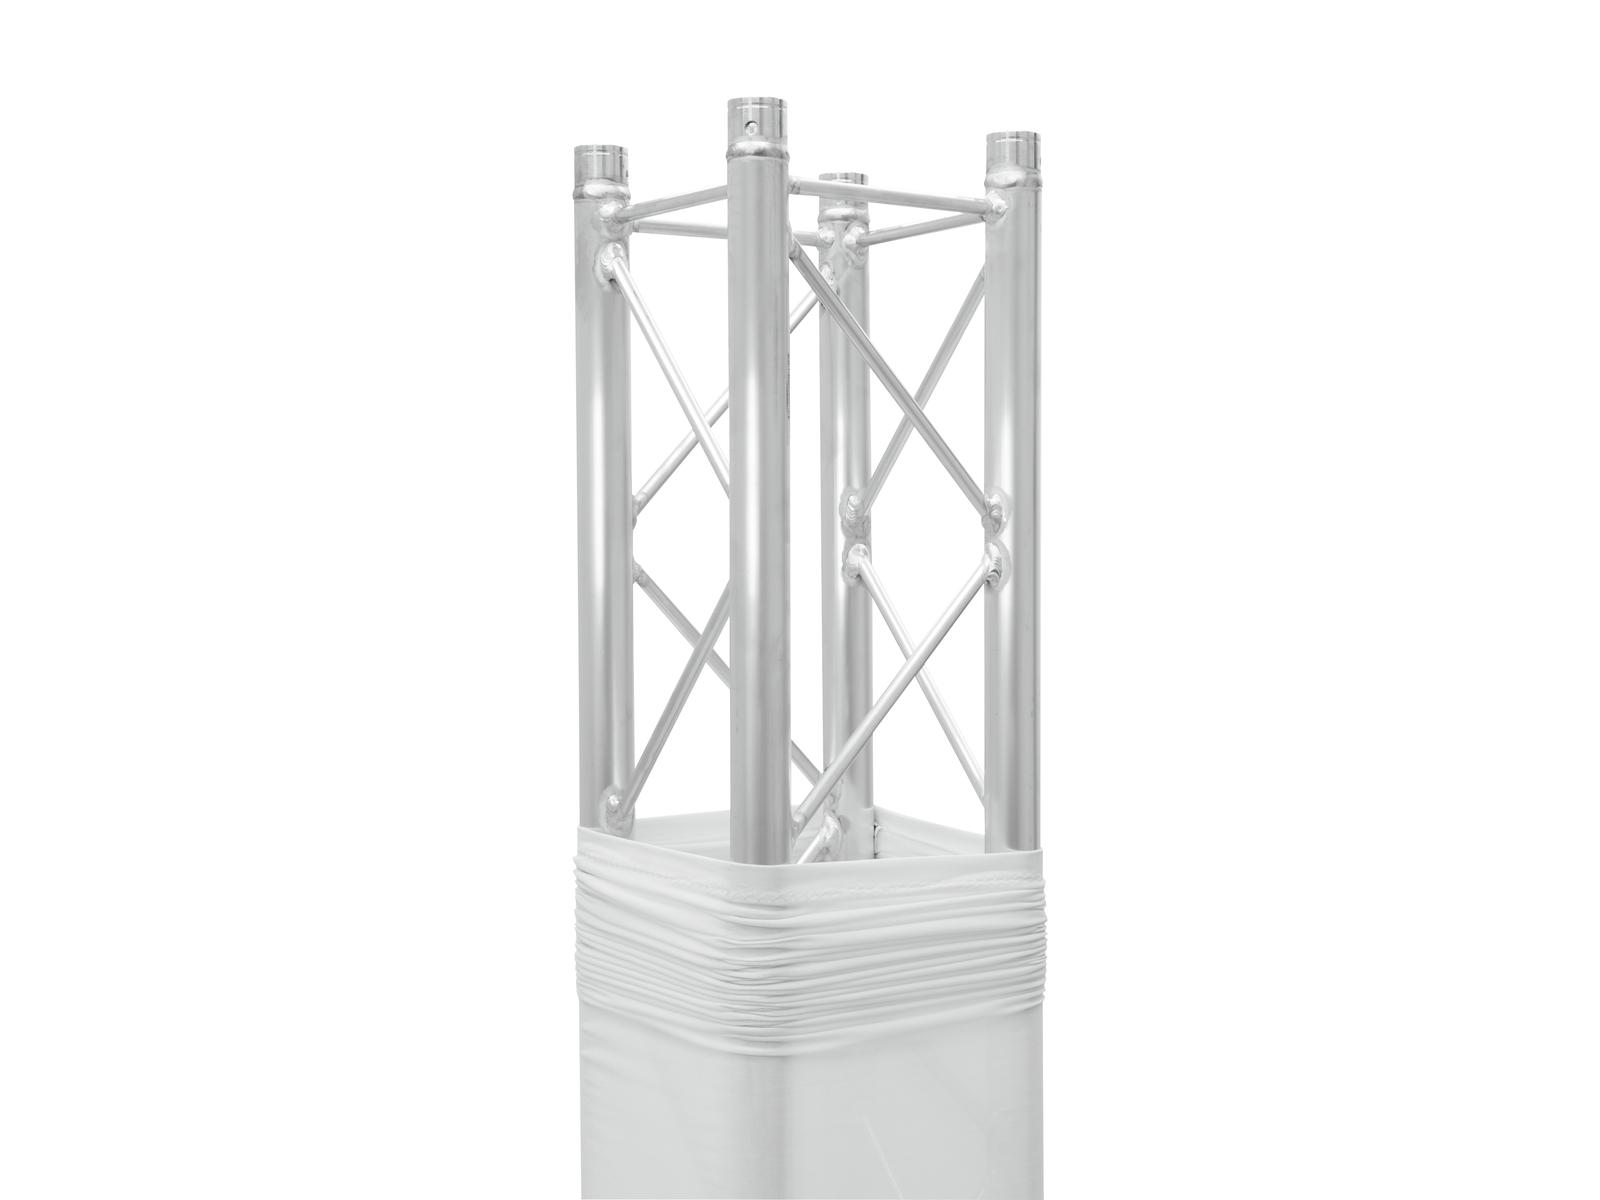 ESPANDERE Trusscover für Decolock 100cm bianco